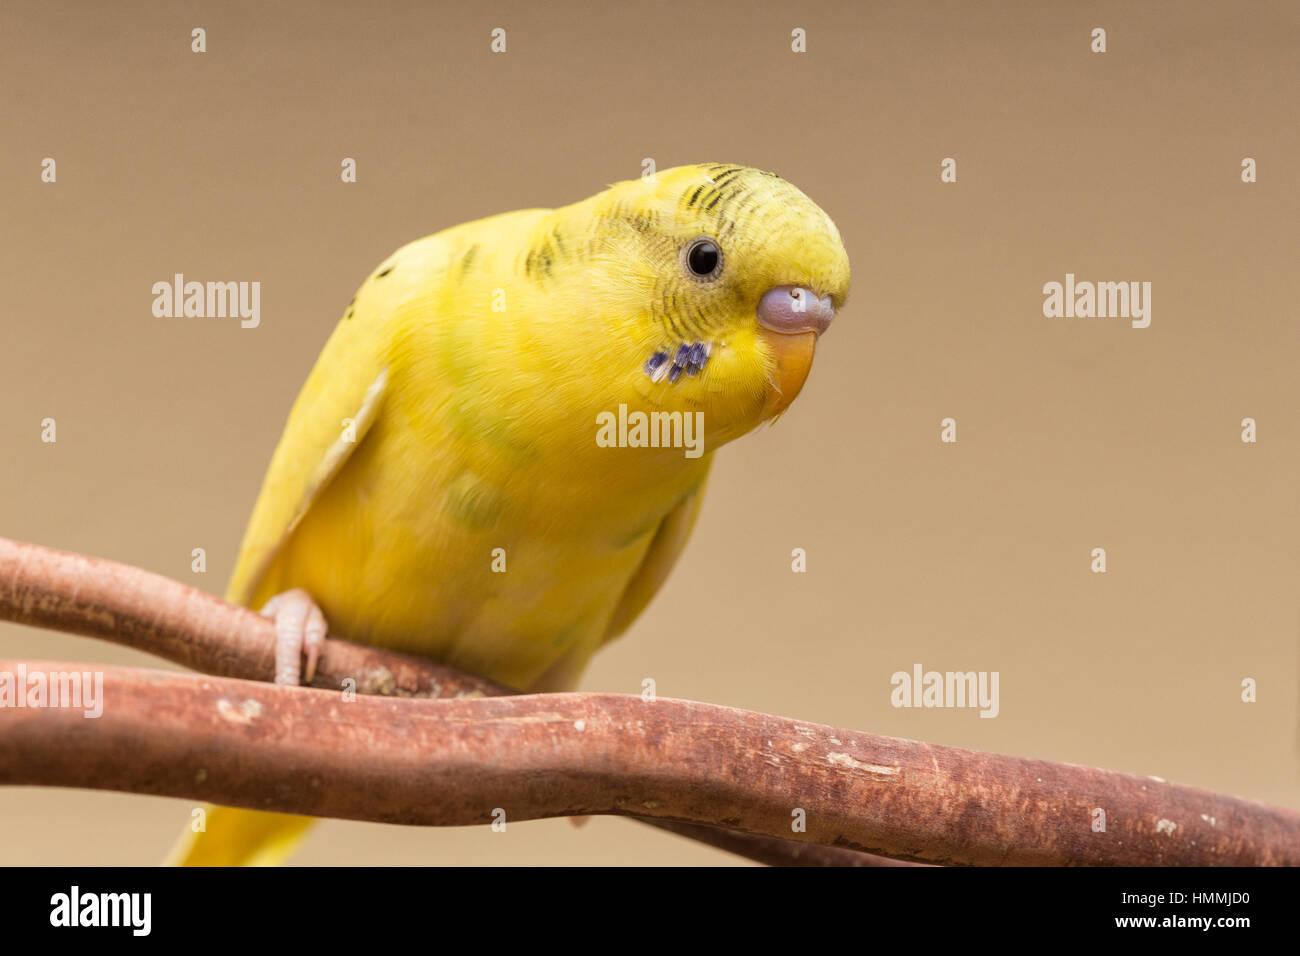 Parakeets - Stock Image